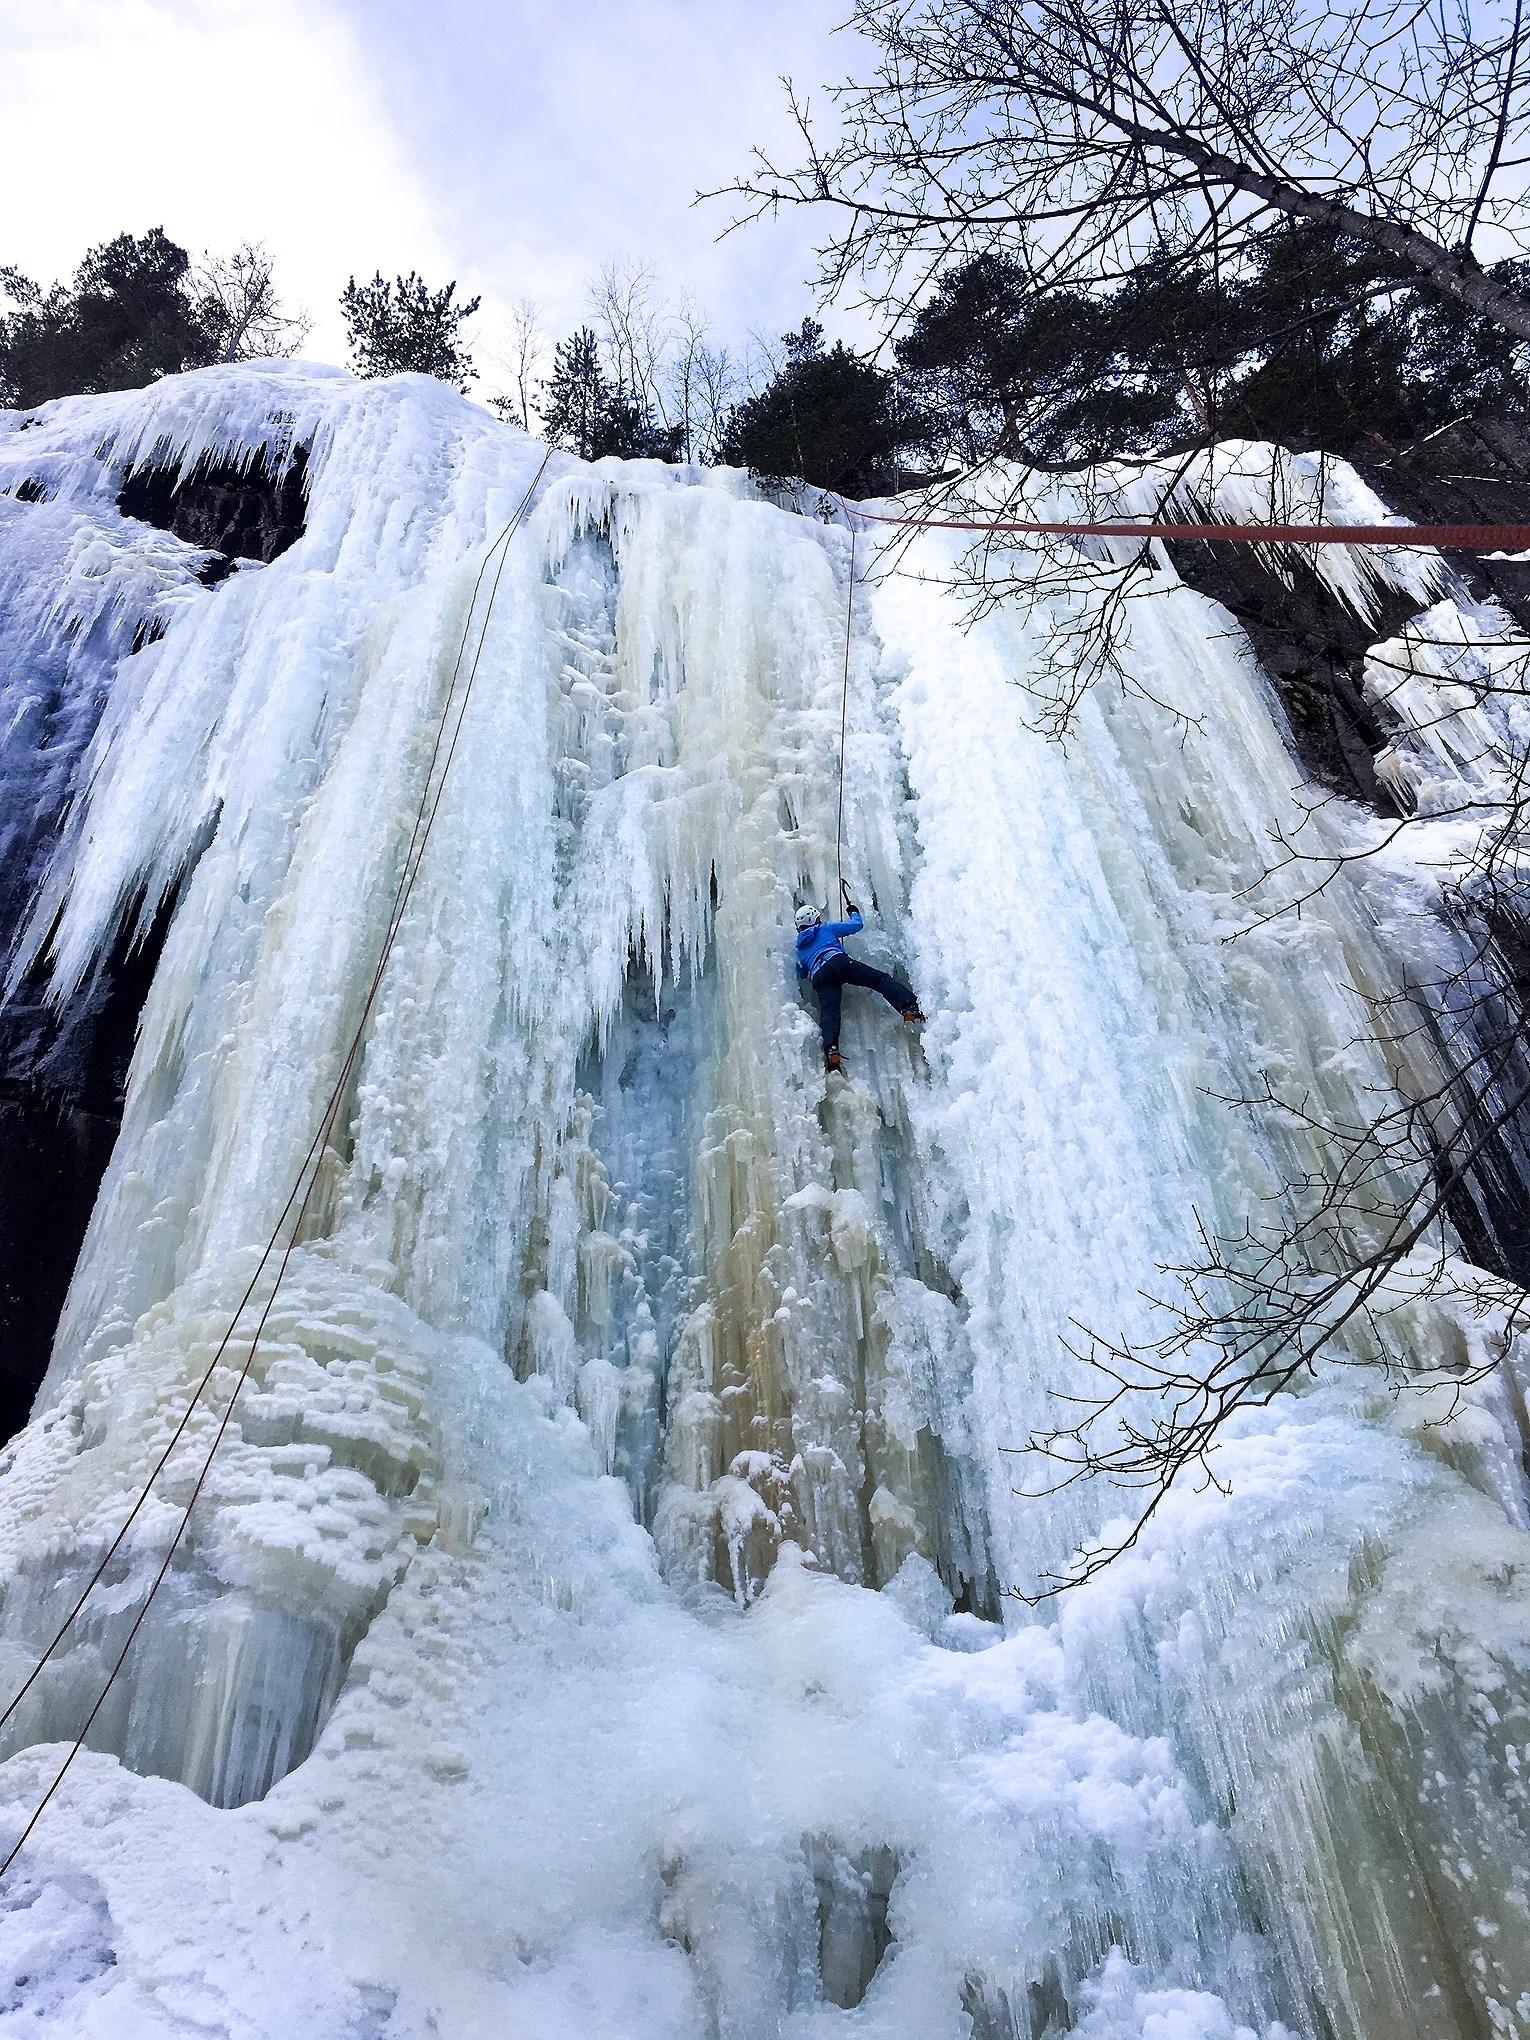 CLIMBING ON ICE.